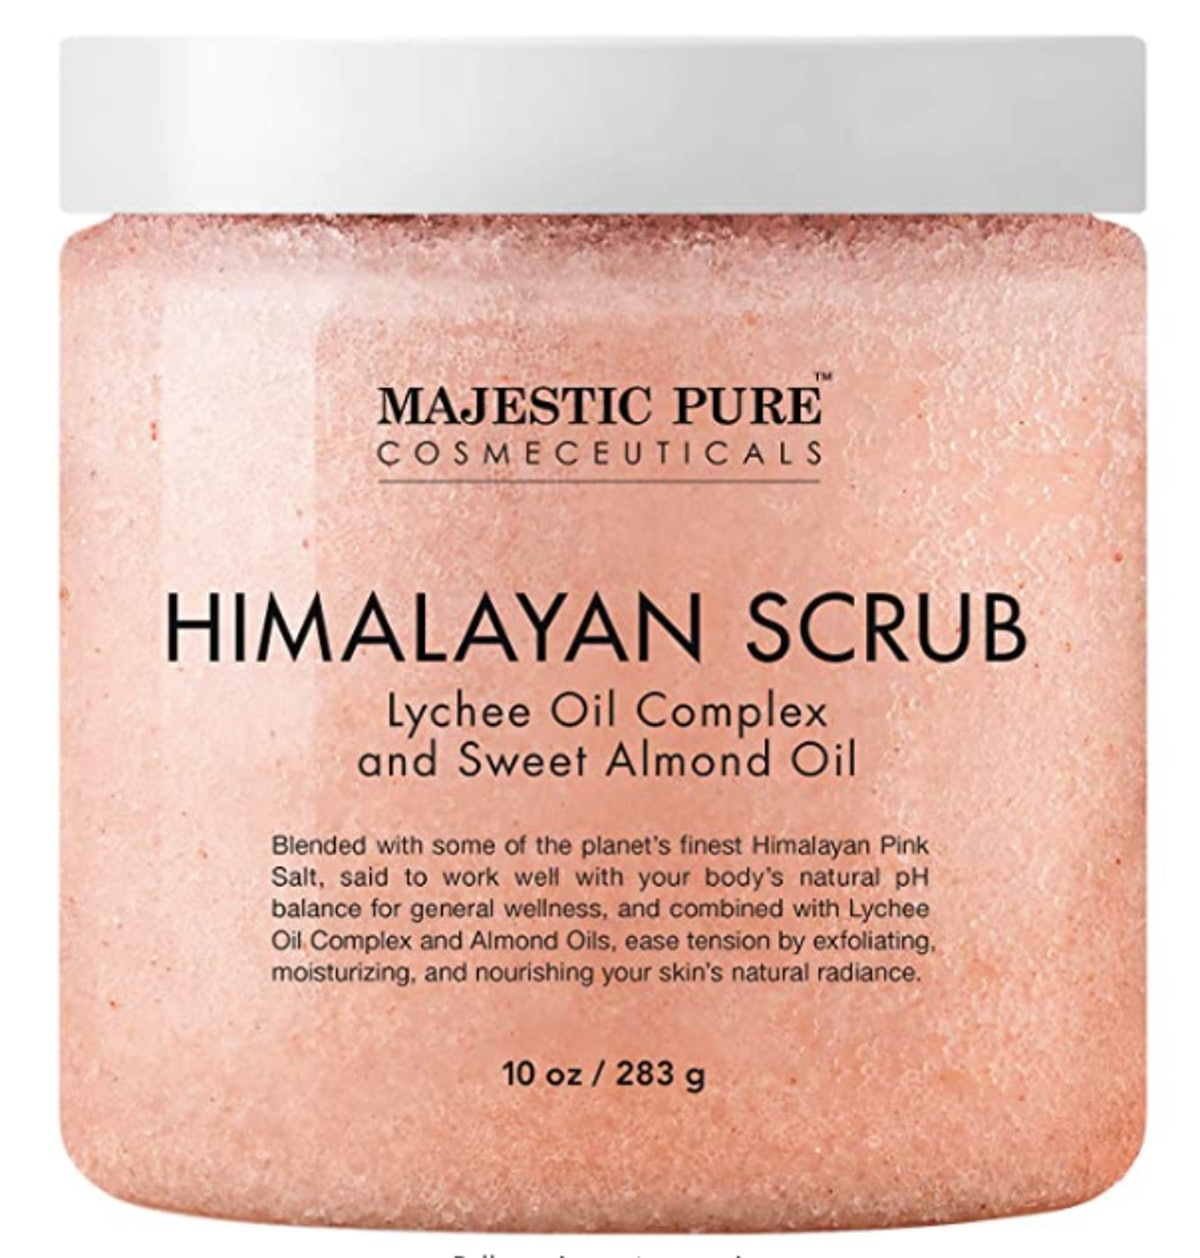 Majestic Pure Himalayan Scrub